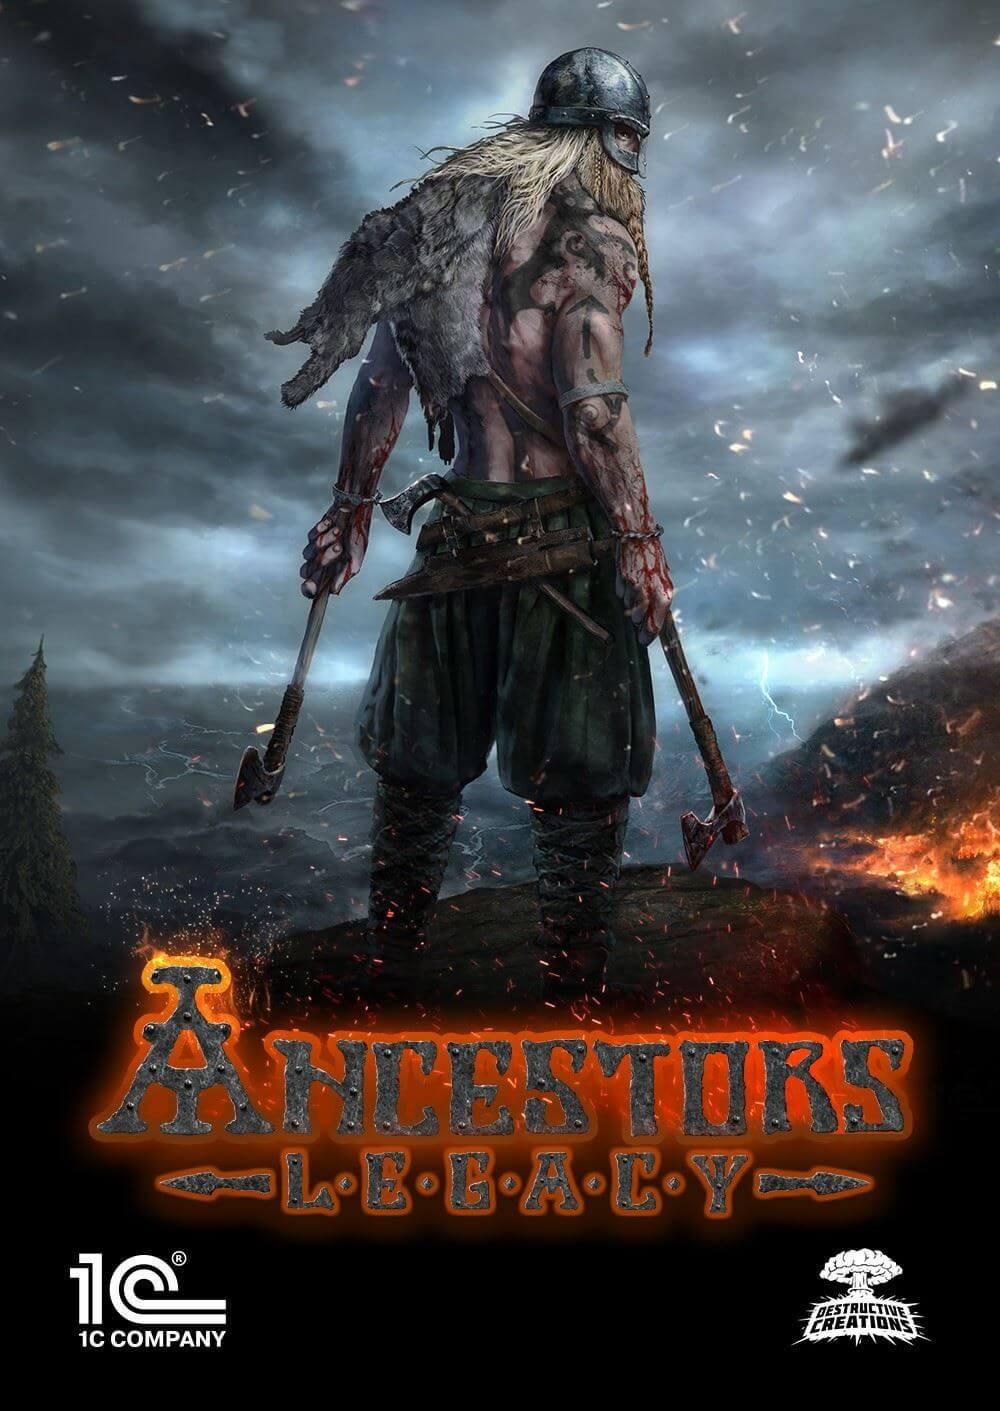 Ancestors Legacy: Digital Artbook